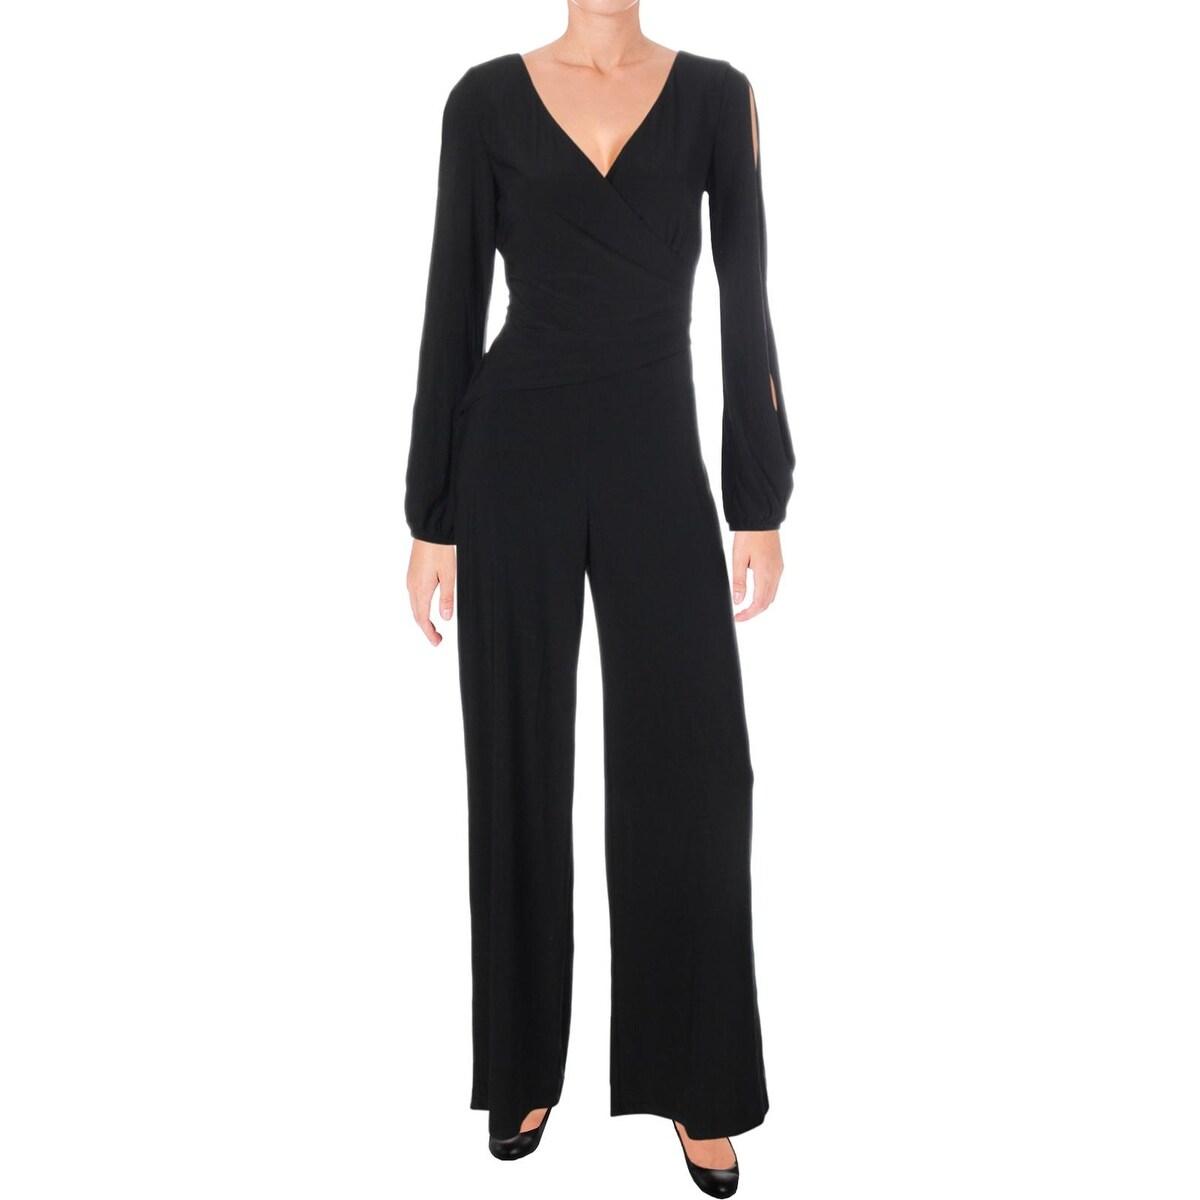 9bb8806aae7 Shop Lauren Ralph Lauren Womens Gustana Jumpsuit Blouson Surplic - On Sale  - Free Shipping On Orders Over  45 - Overstock - 25859082